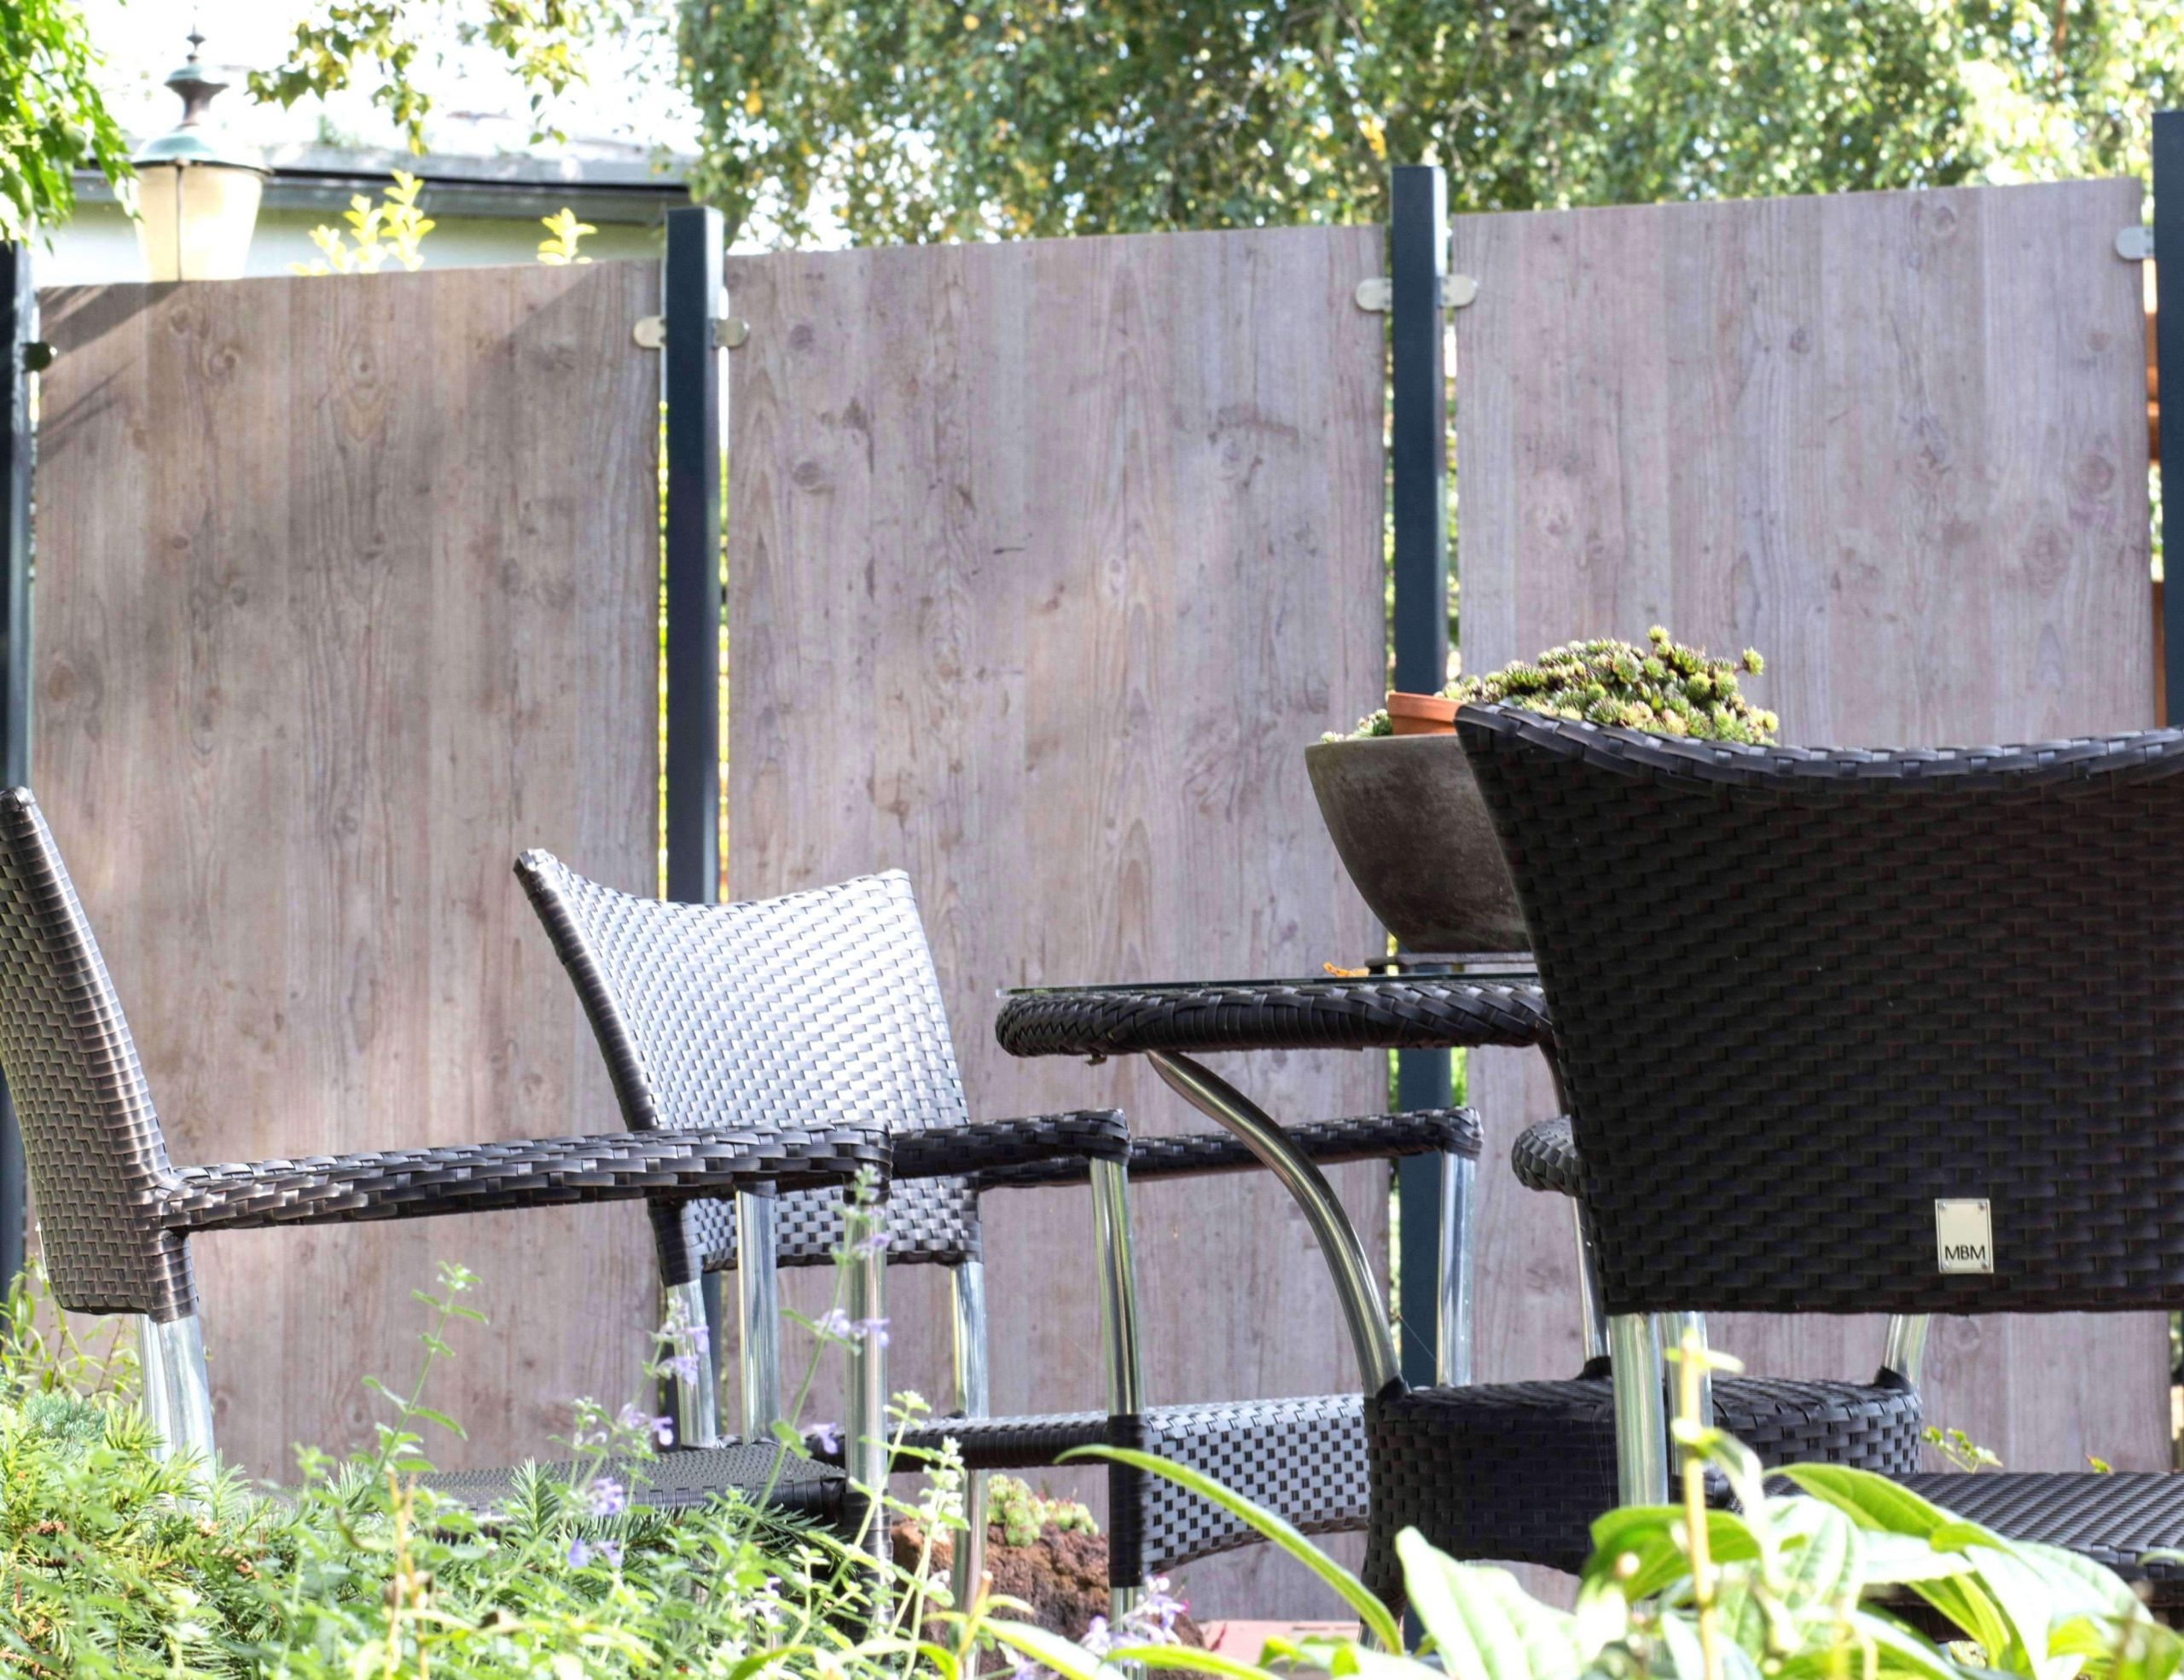 25 Luxus Garten Ideen Sichtschutz Garten Deko